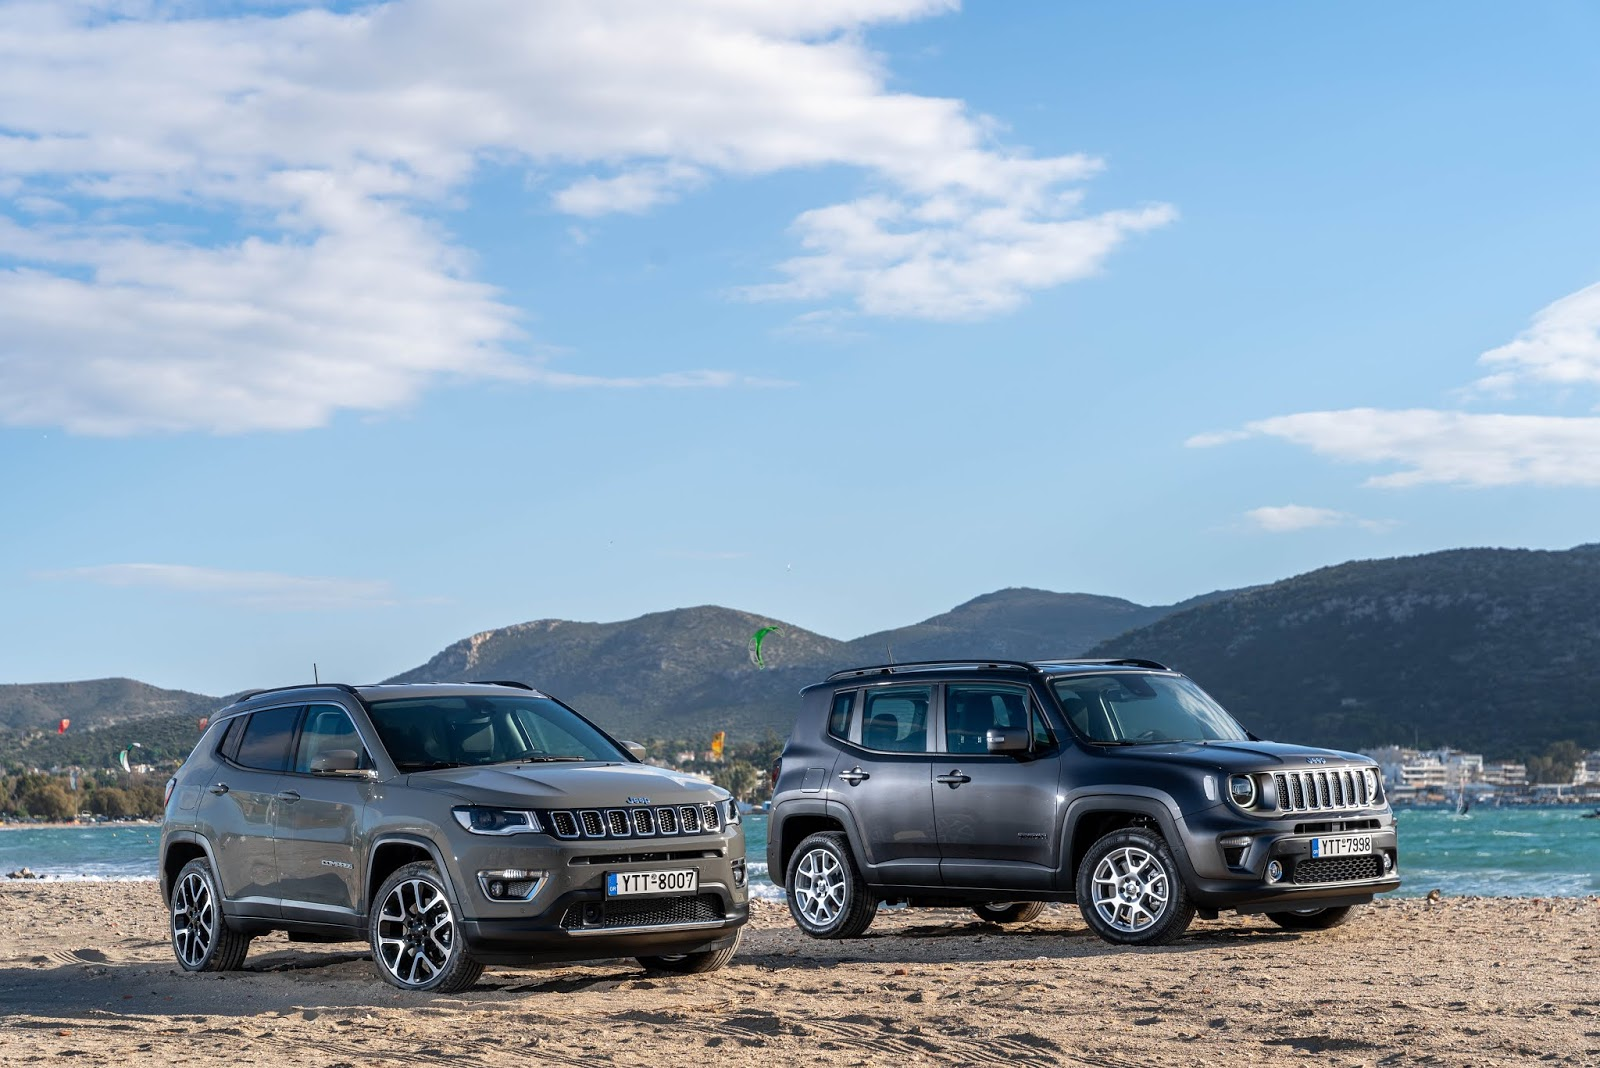 common 5ff71404de0b0 Νέα γκάμα Jeep : Σπάει τα στερεότυπα Jeep, ειδήσεις